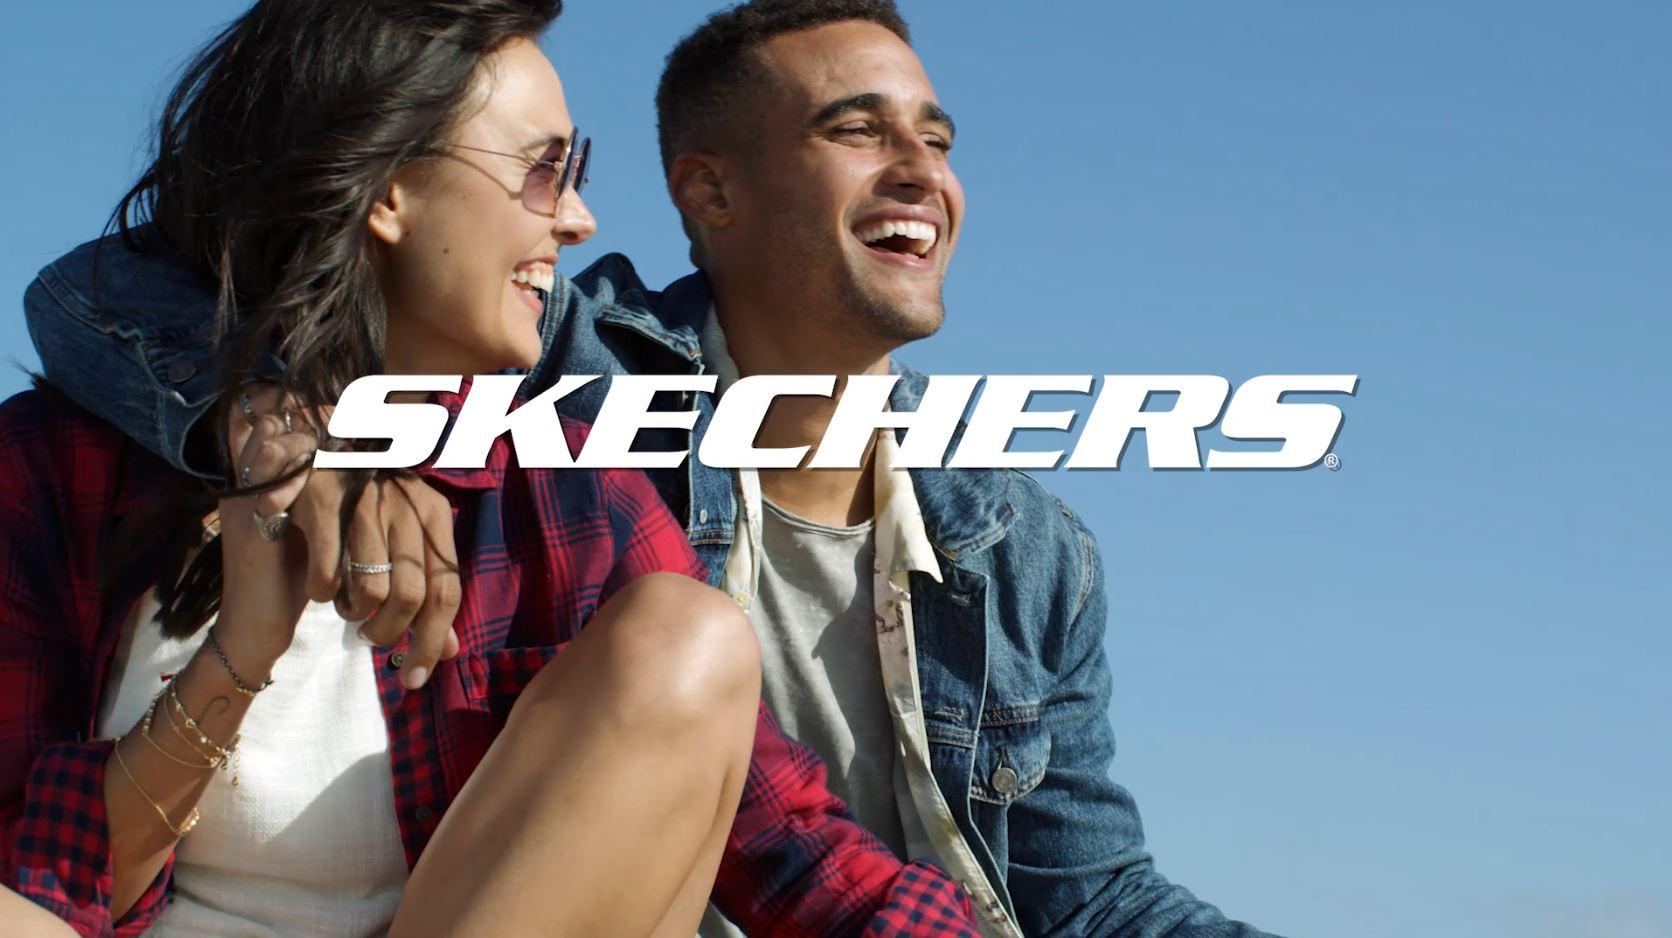 Skechers Sport Lifestyle | TV Spot 2019